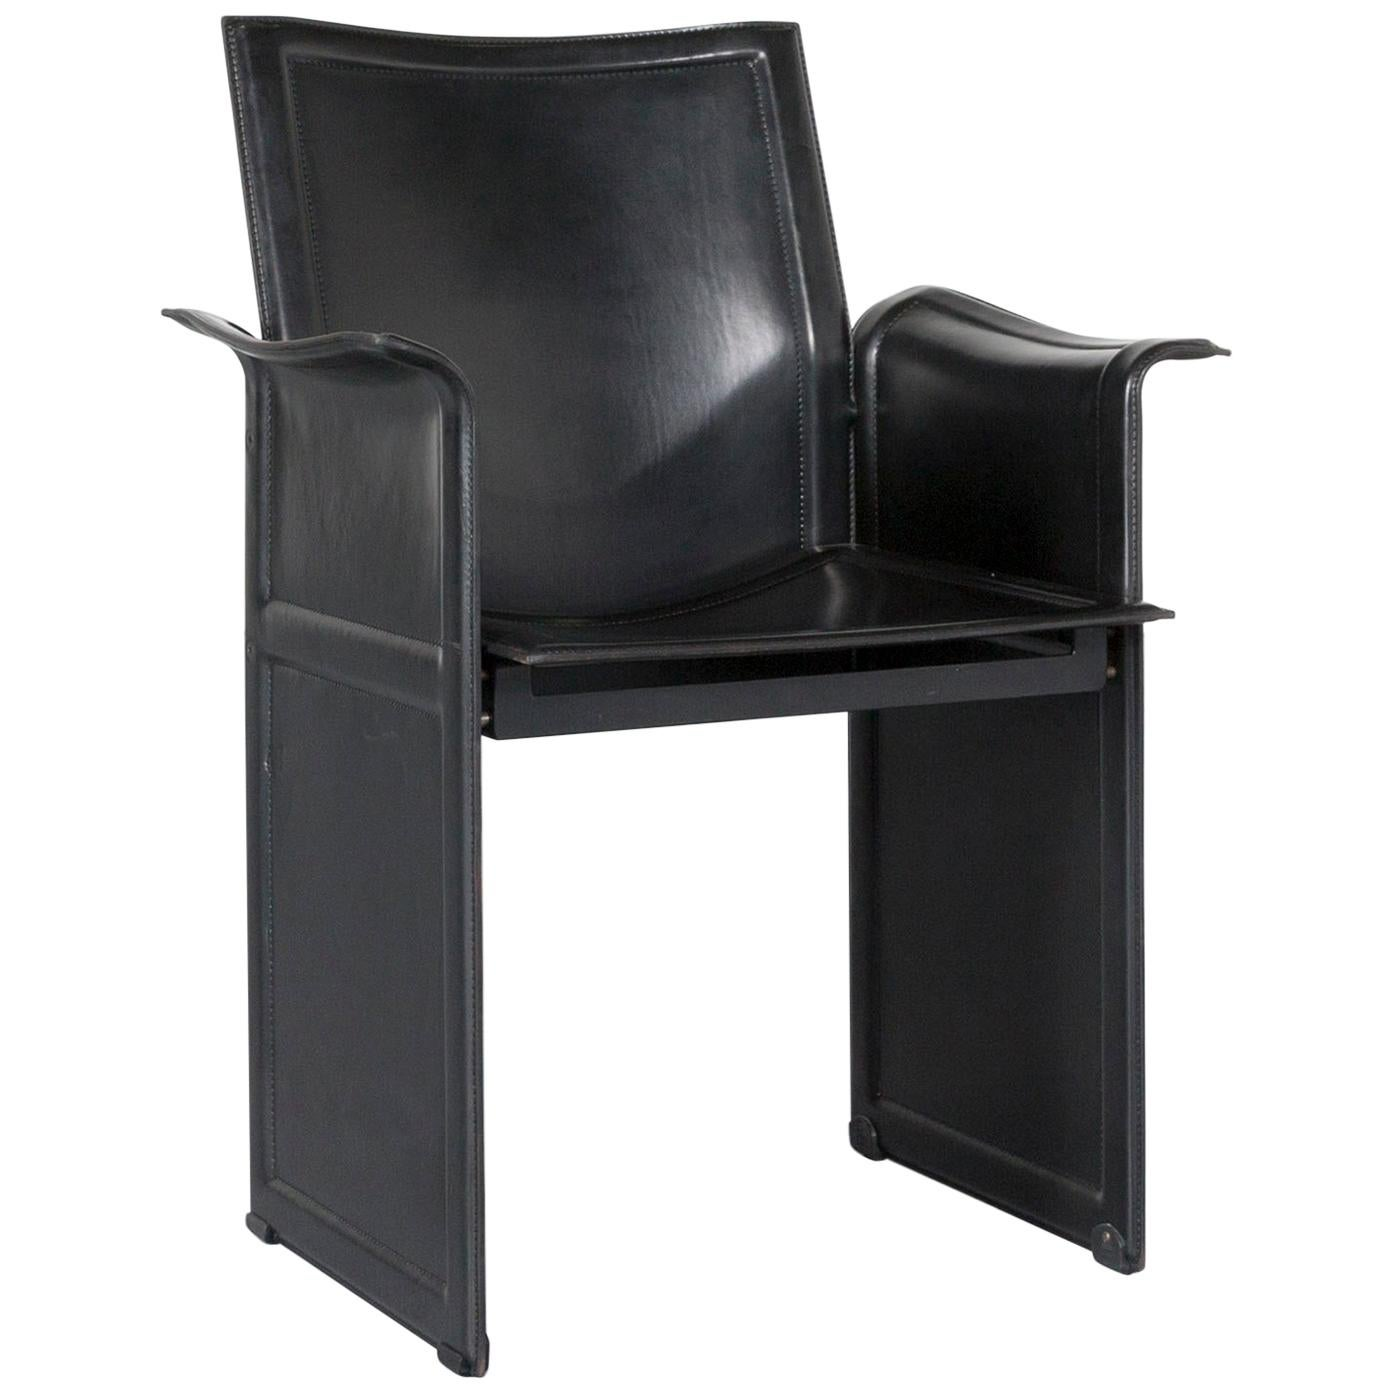 Matteo Grassi Korium KM1 Leather Chair Black One Seat